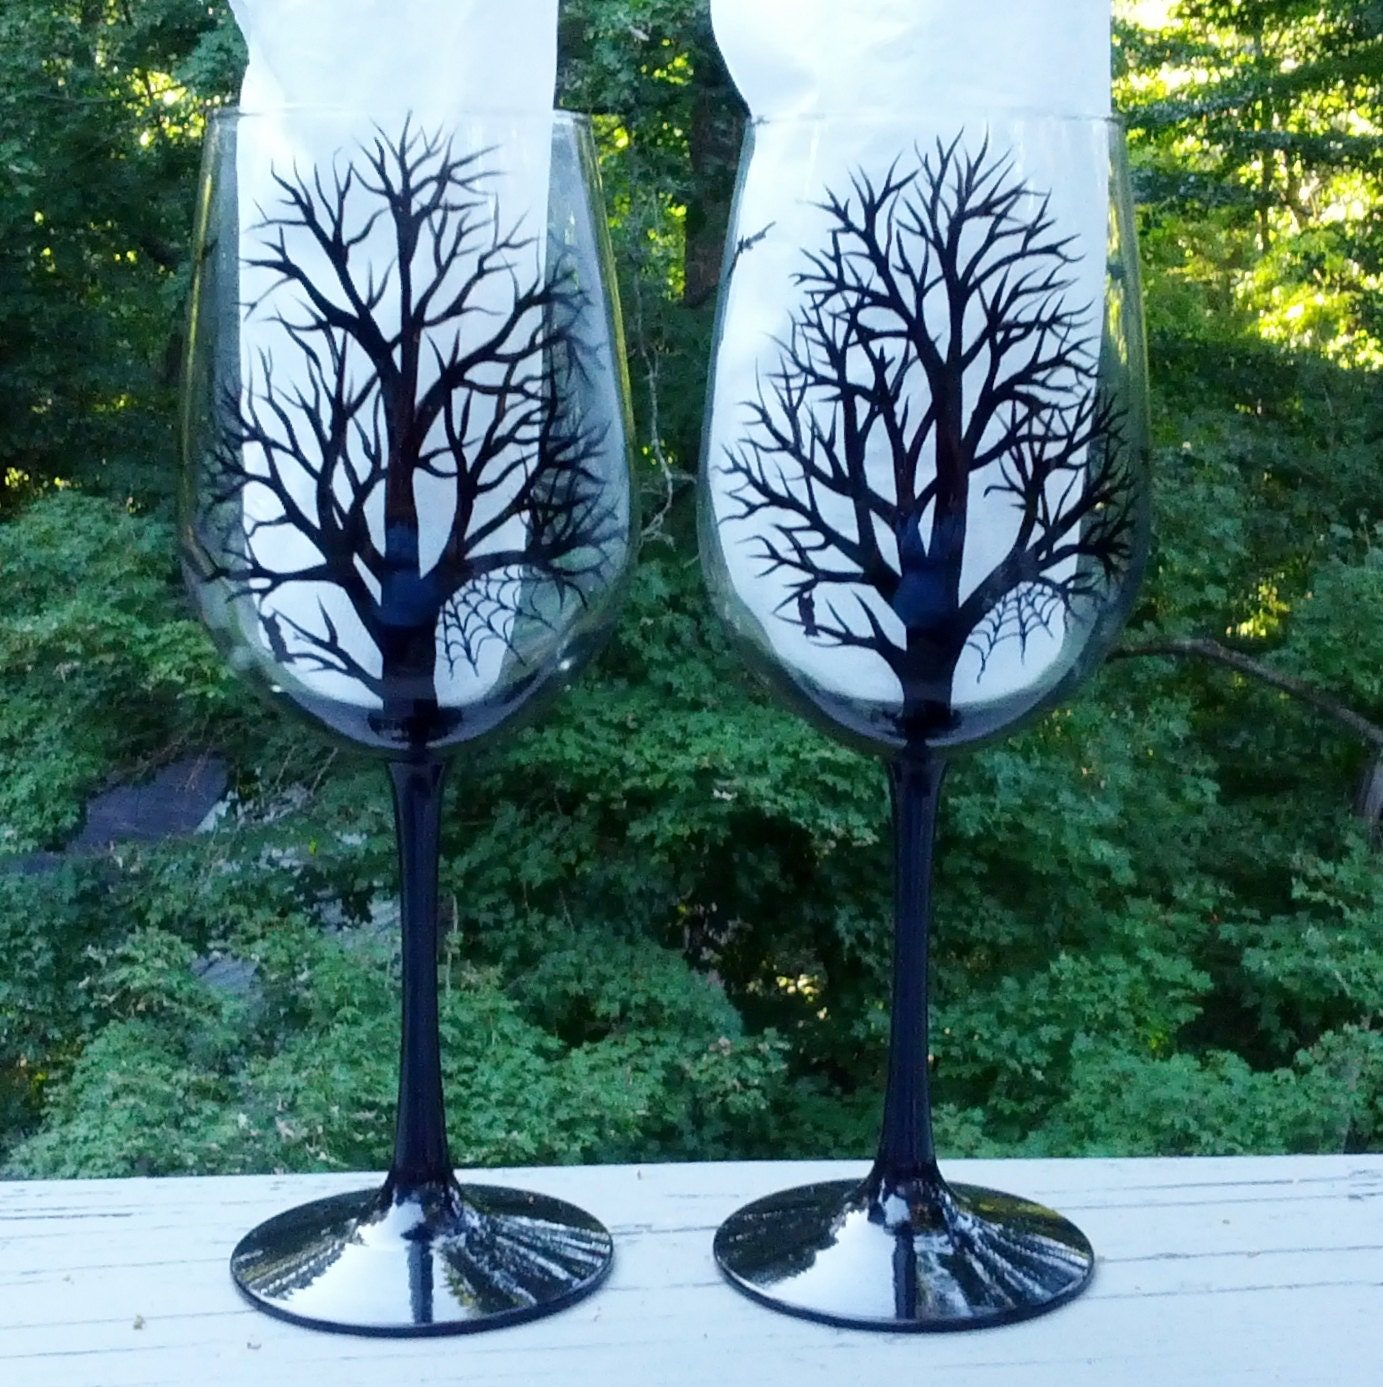 Spooky Halloween Black Tree Silhouette Hand Painted Wine